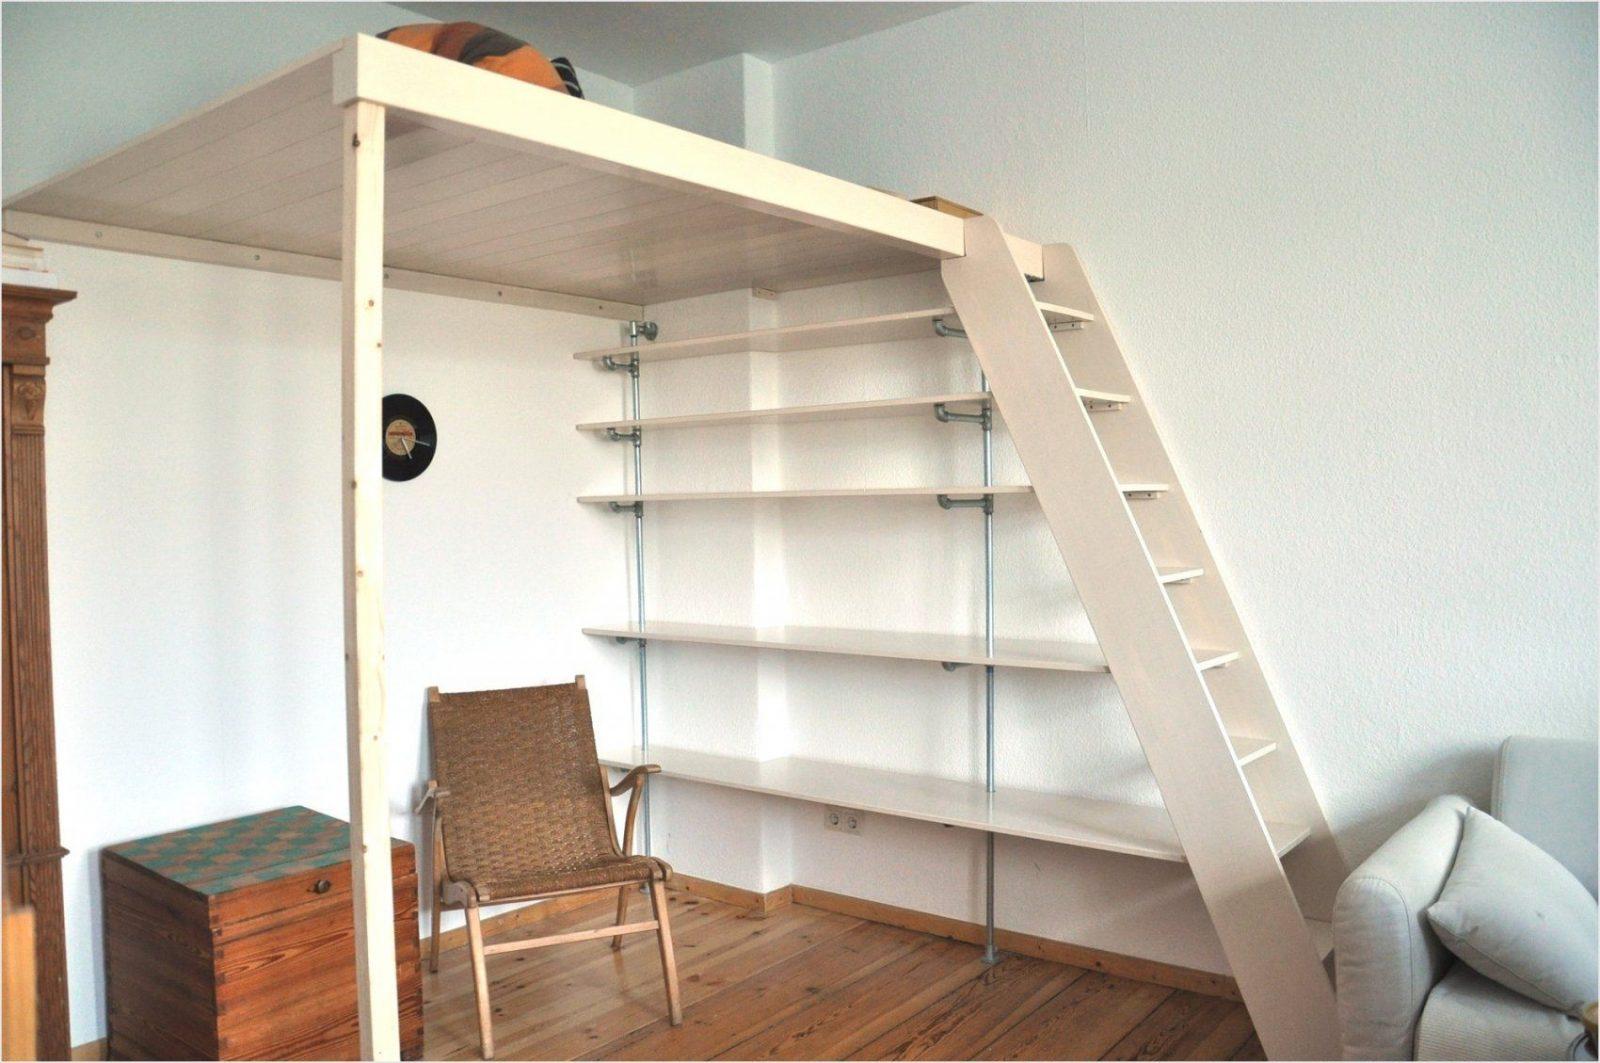 Faszinierend Stilvoll Hochbett Zum Hochbett Selbst Gebaut Avec von Hochbett Selber Bauen Ideen Photo